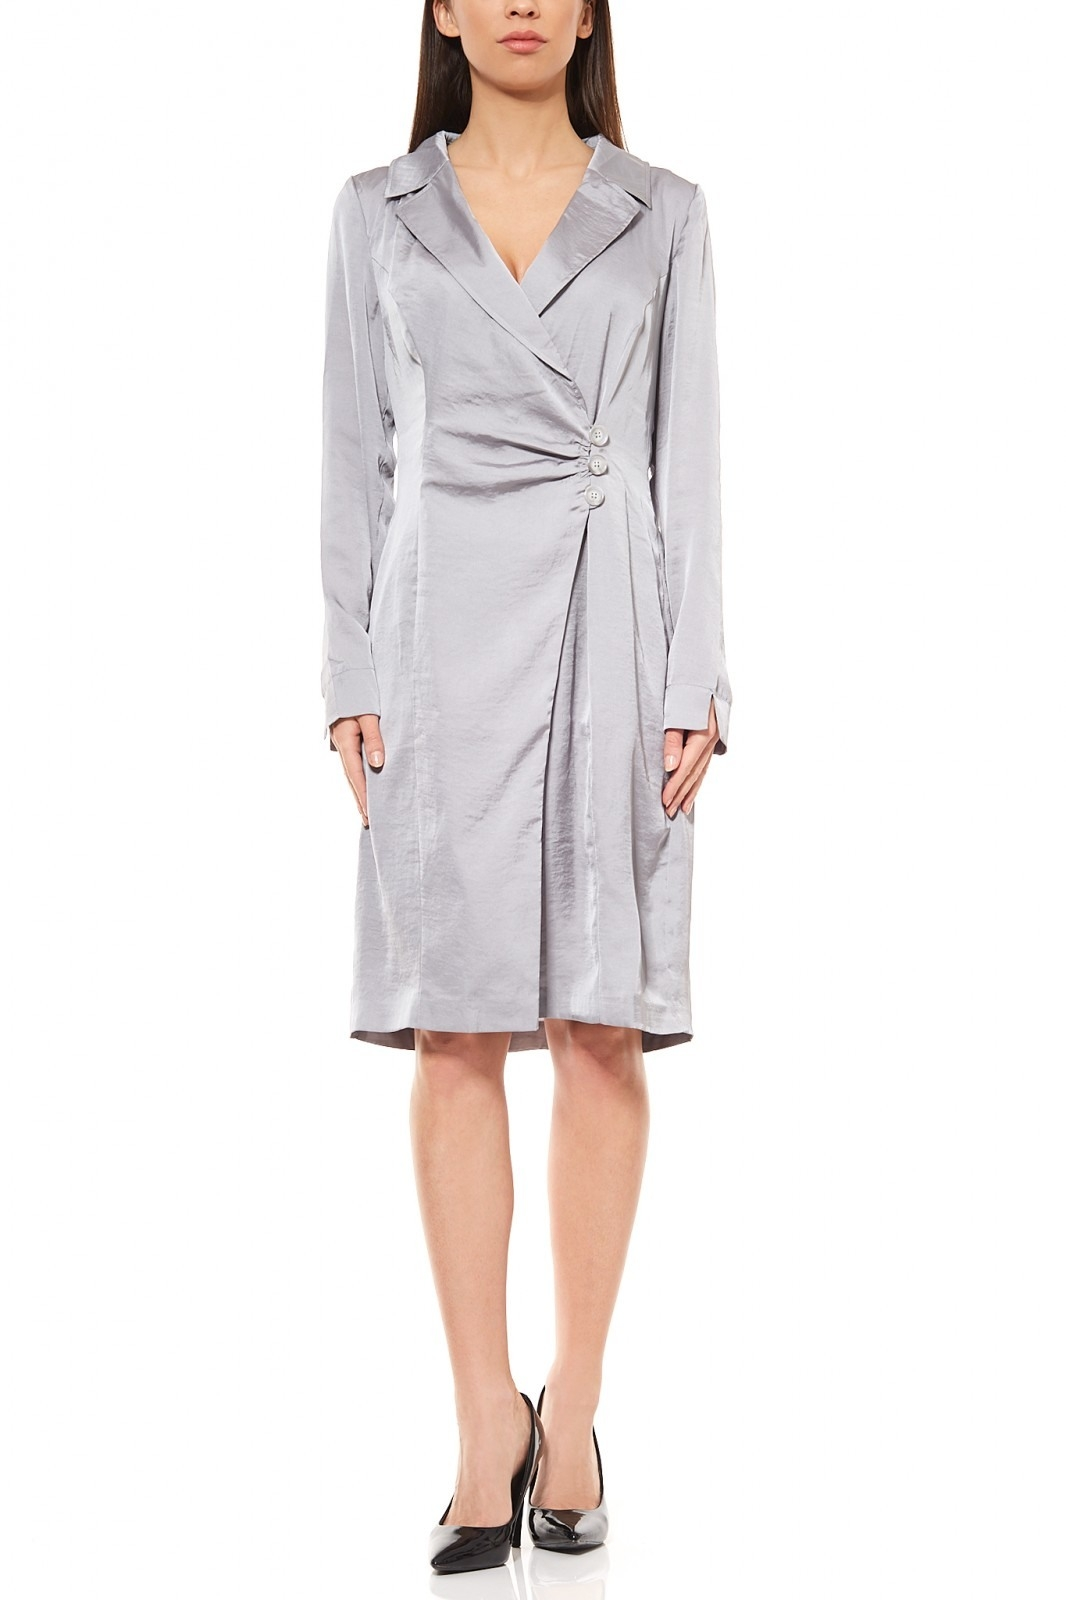 17 Elegant Wickelkleid Abendkleid Stylish13 Erstaunlich Wickelkleid Abendkleid für 2019